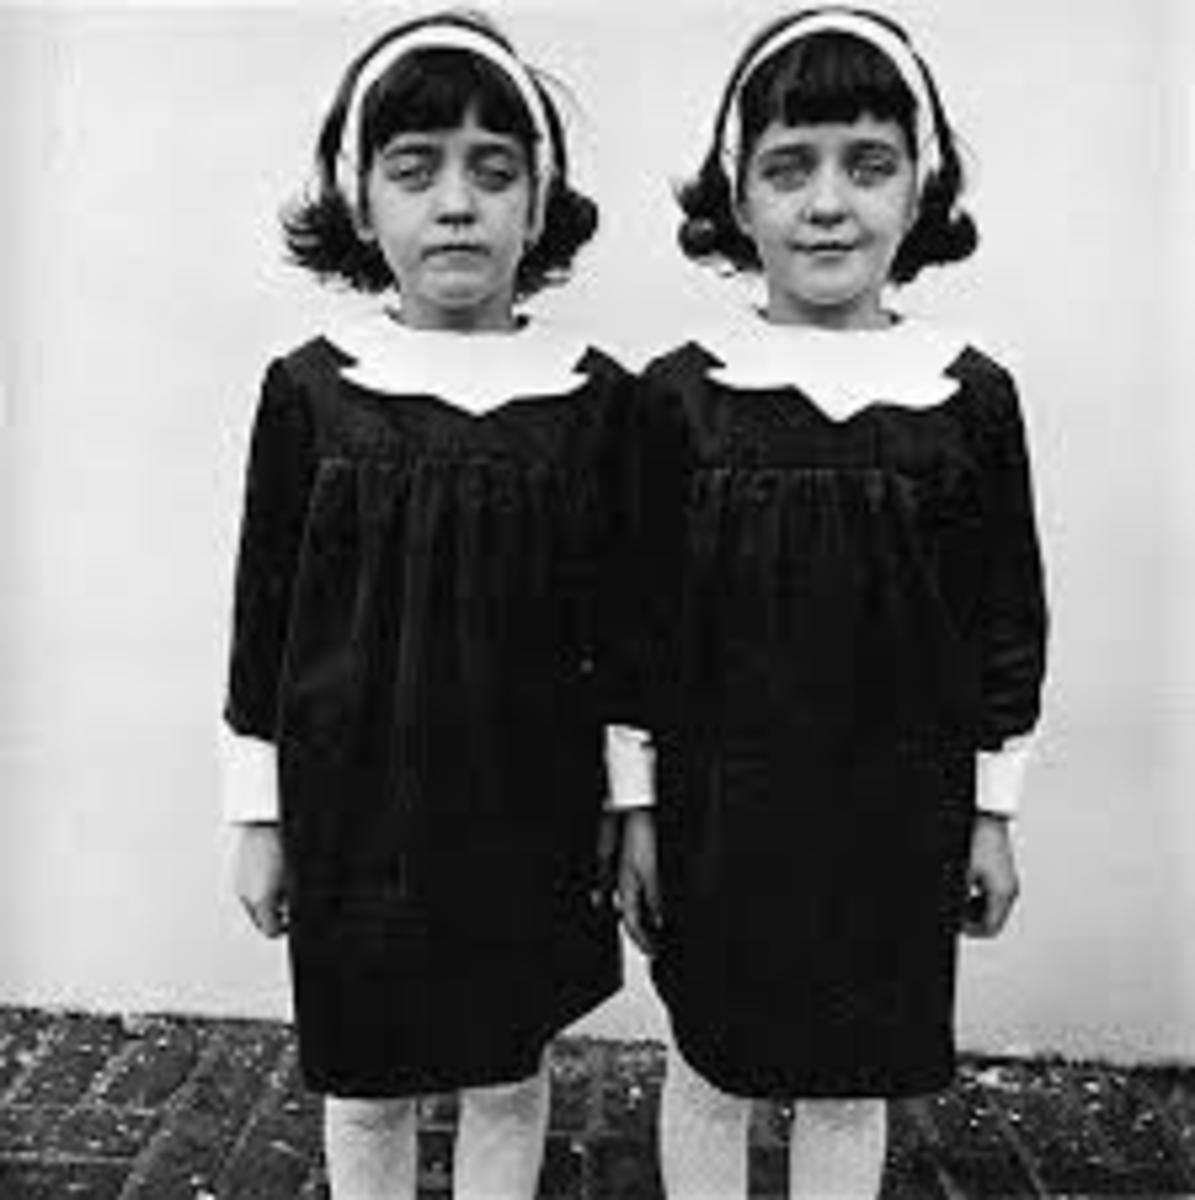 Pollock Twins